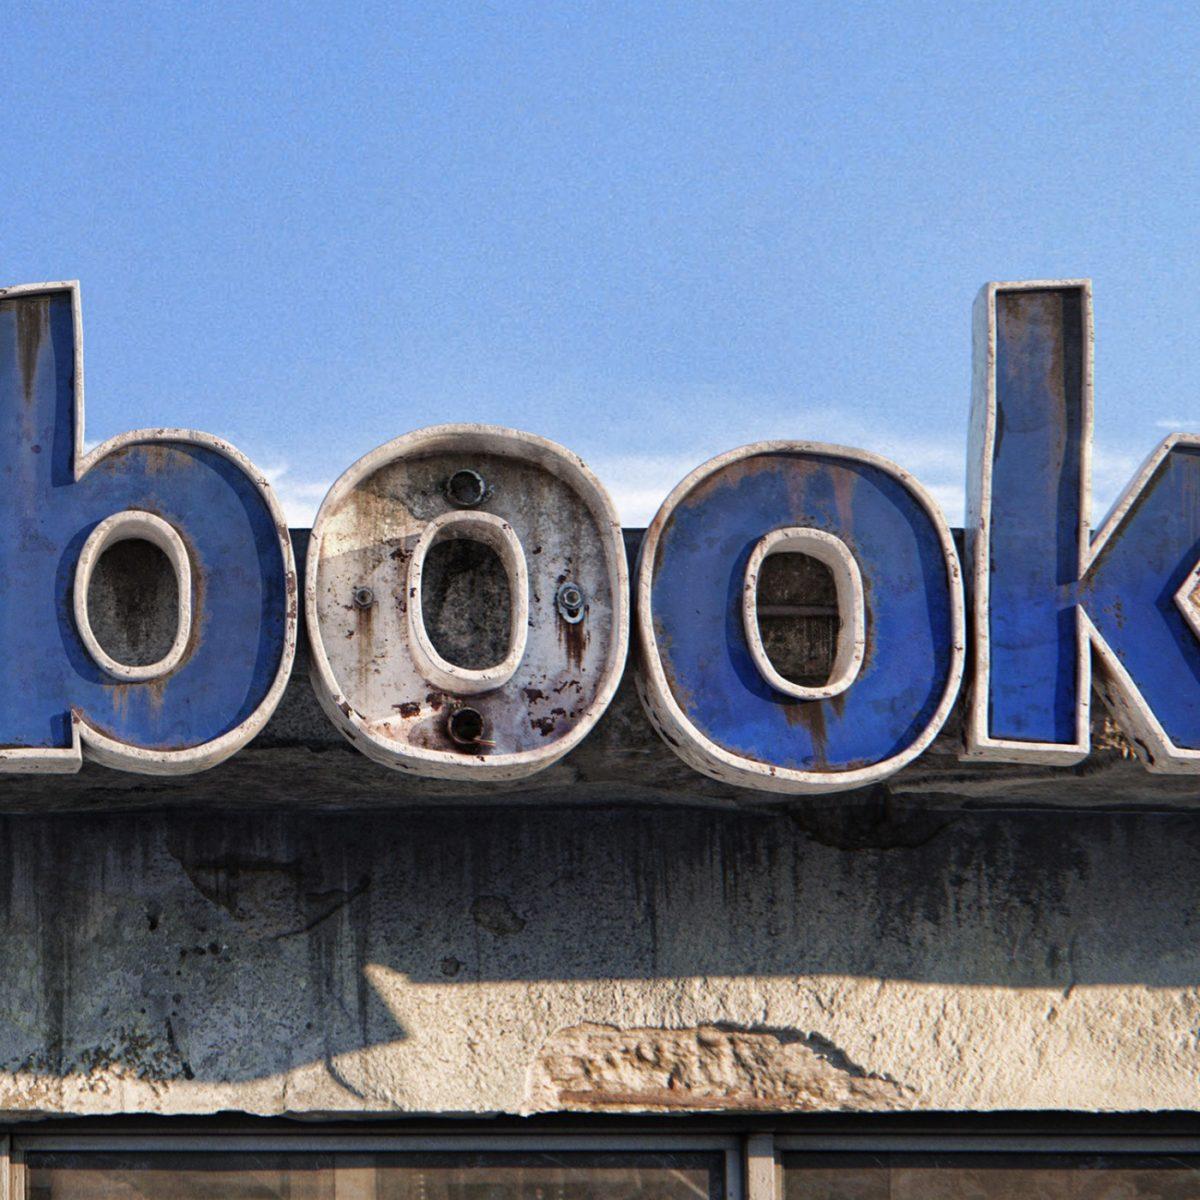 AndreiLacatusu social decay lettres logo enseigne typographie urbain urbex book - Social decay : les logos de Twitter, Facebook et Tinder transformés en enseignes vintage